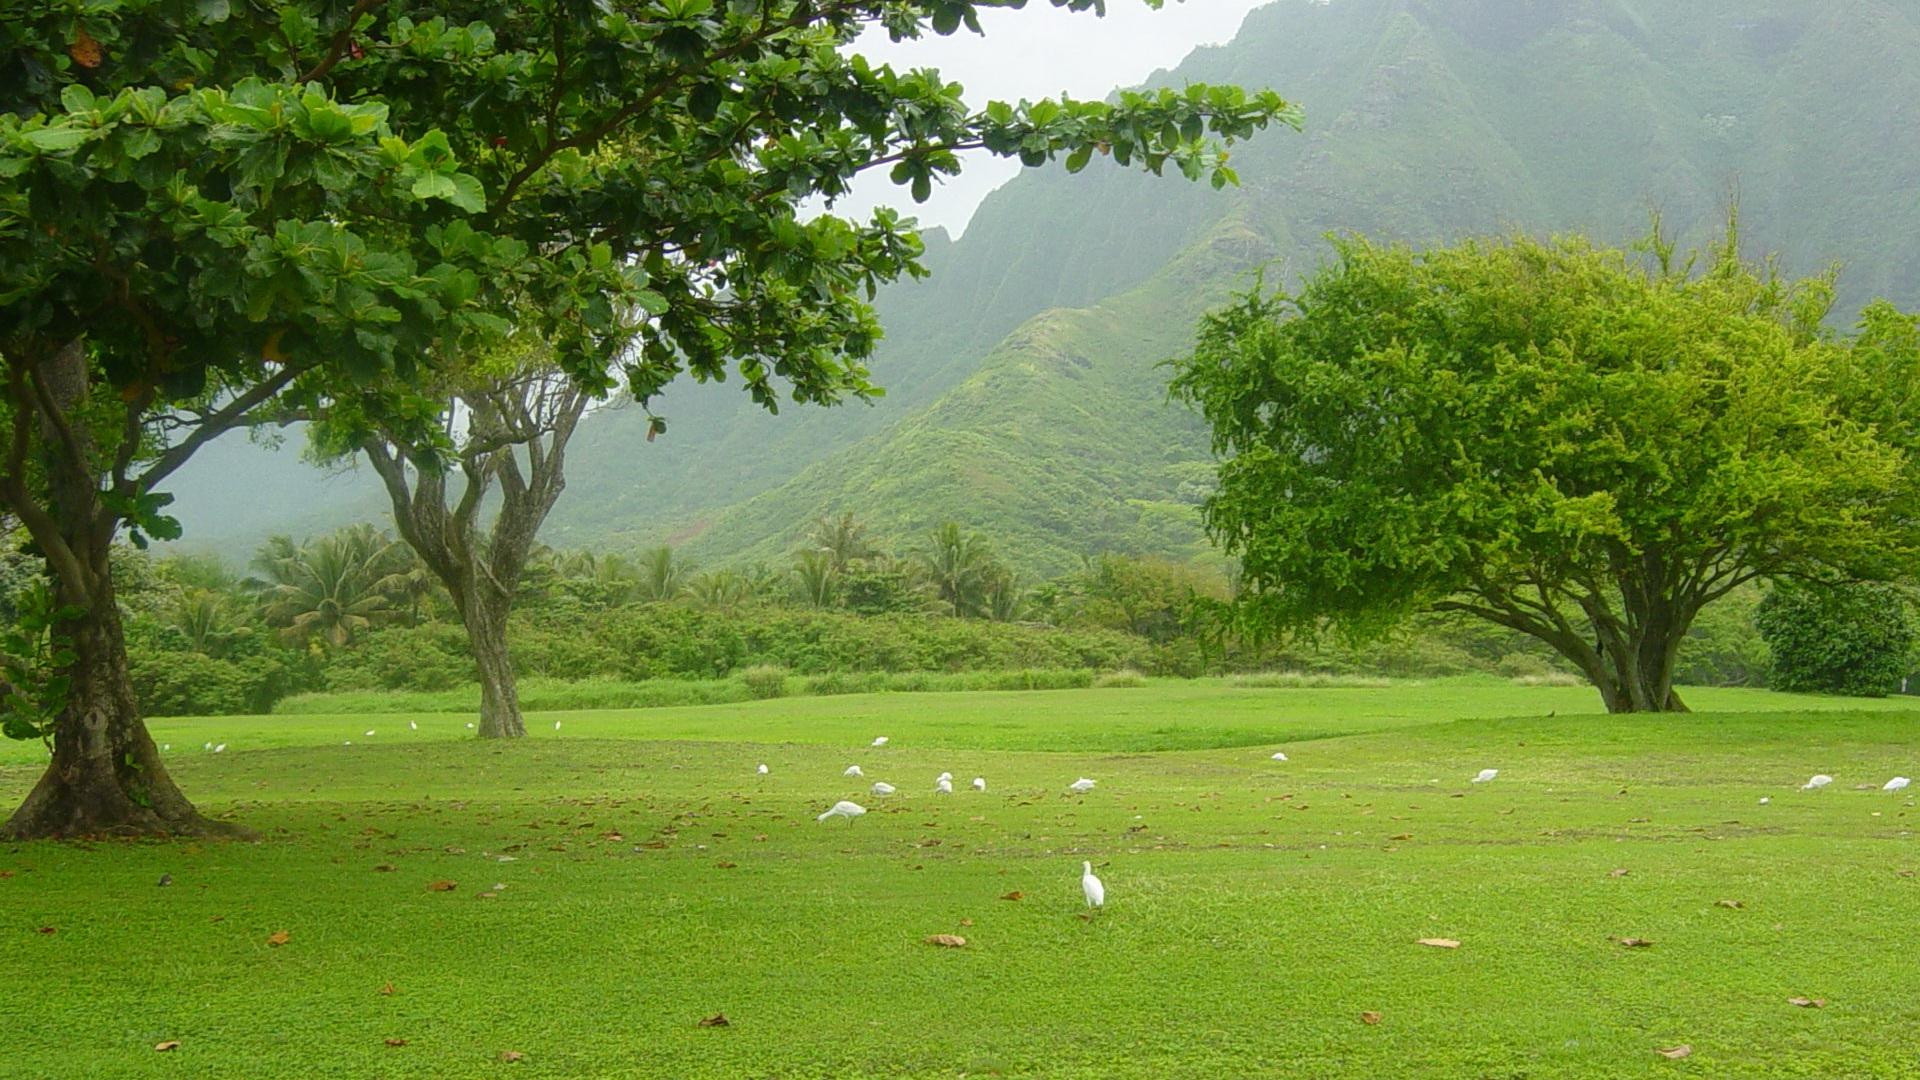 Green Landscape Wallpapers, Top HD Green Landscape Backgrounds, #VEJ ...